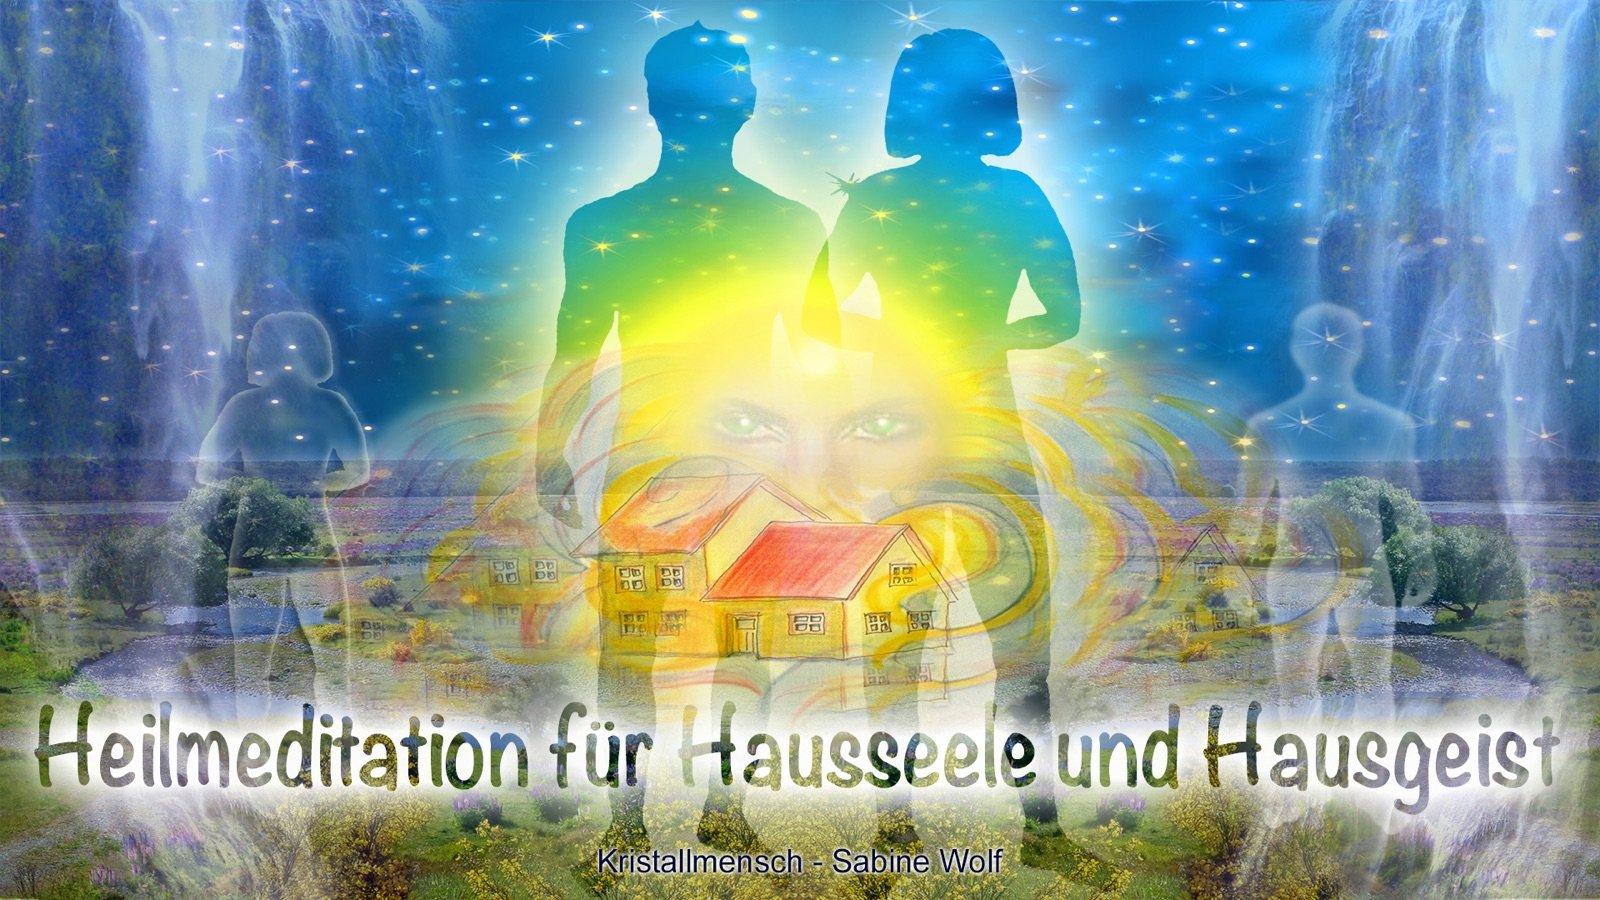 19_12_Haus_Seele_Geist_l